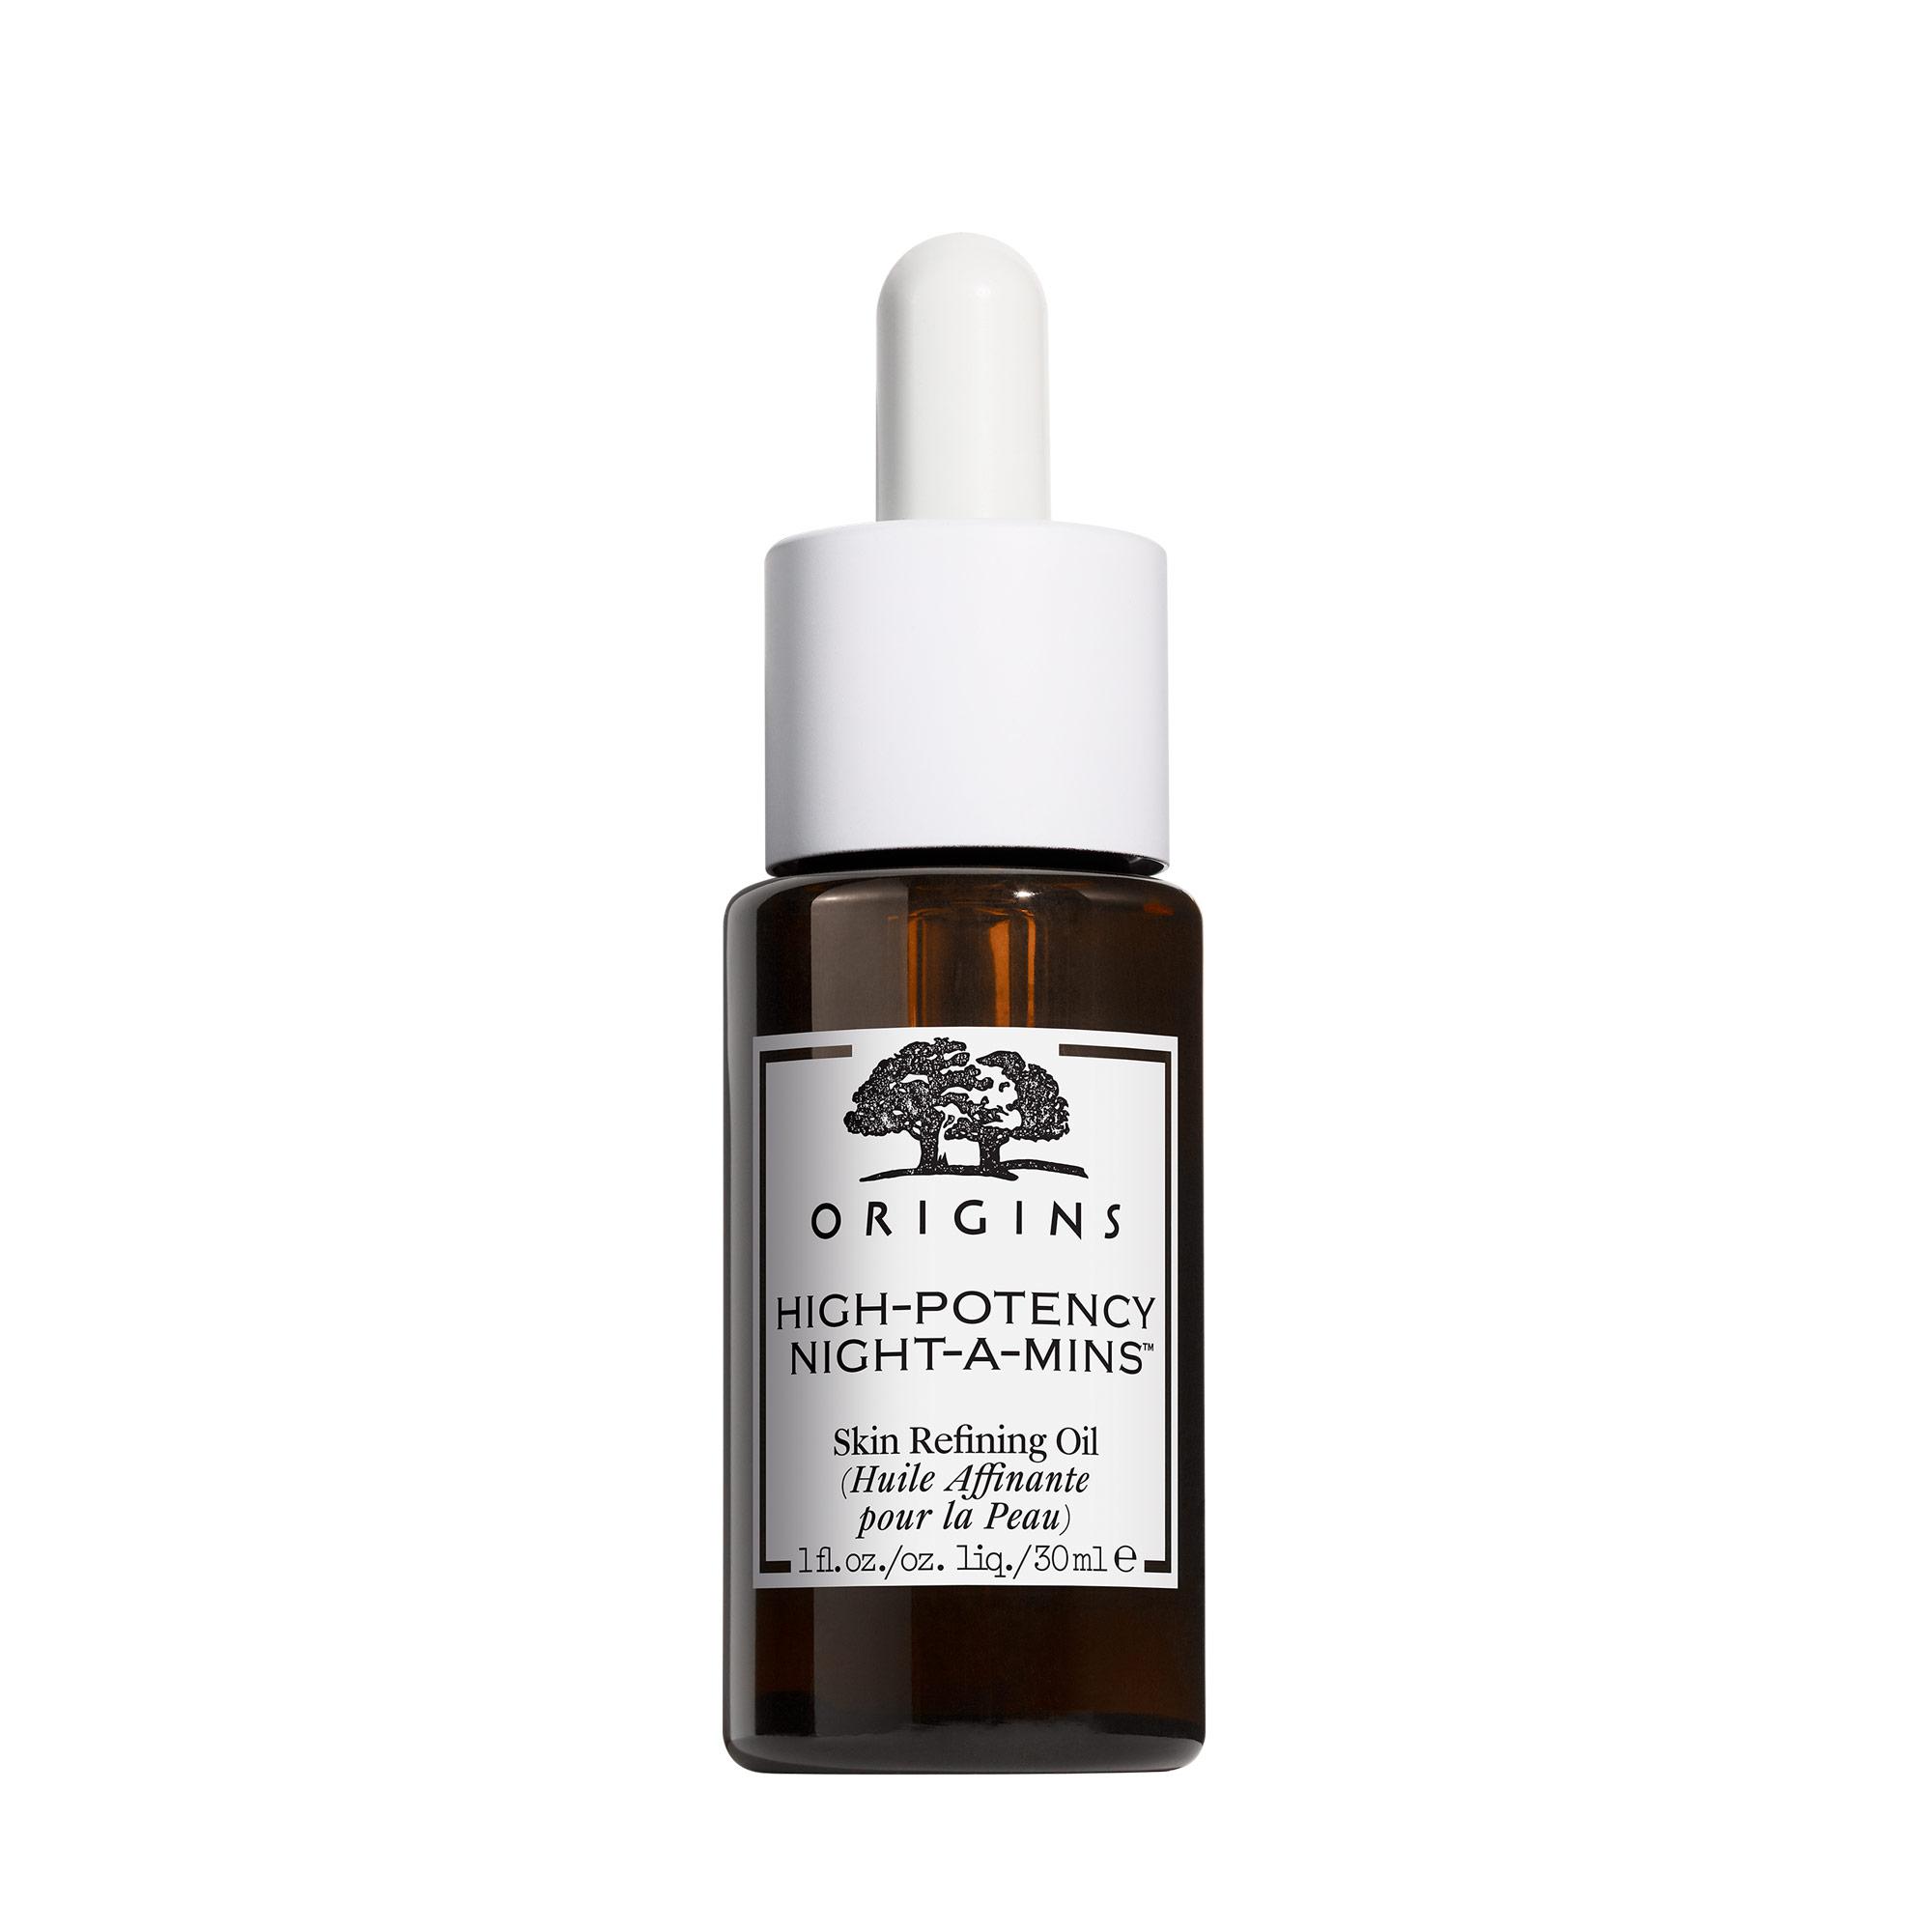 High Potency Night-A-Mins Skin Refining Oil